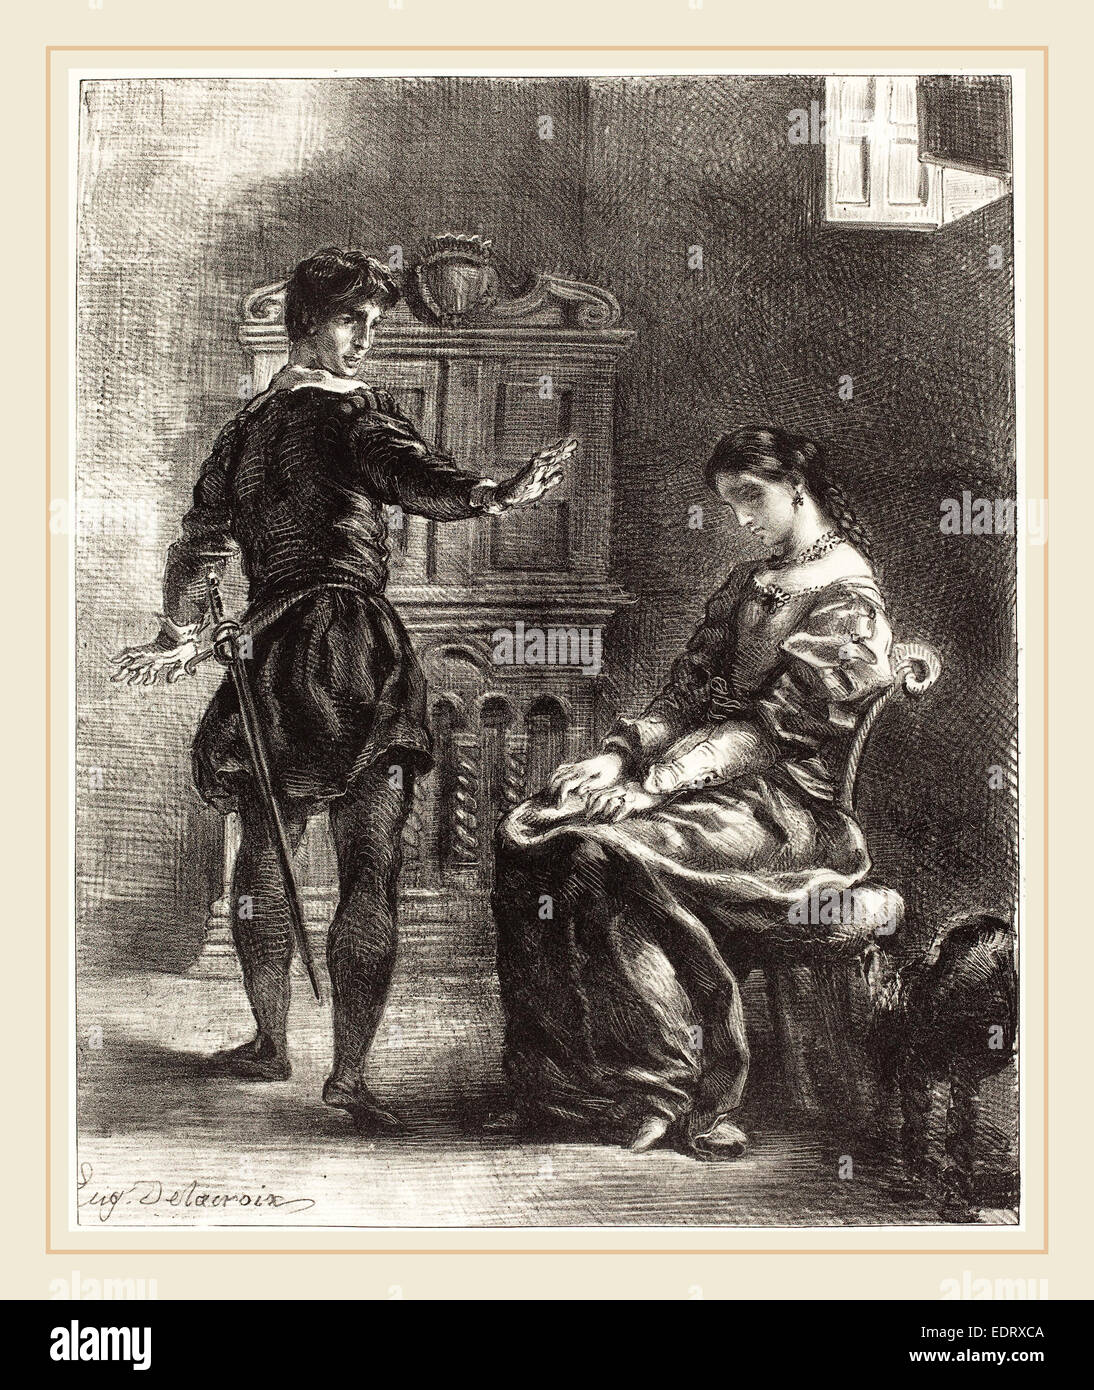 Eugène Delacroix (French, 1798-1863), Hamlet and Ophelia (Act III, Scene I), 1834-1843, lithograph - Stock Image